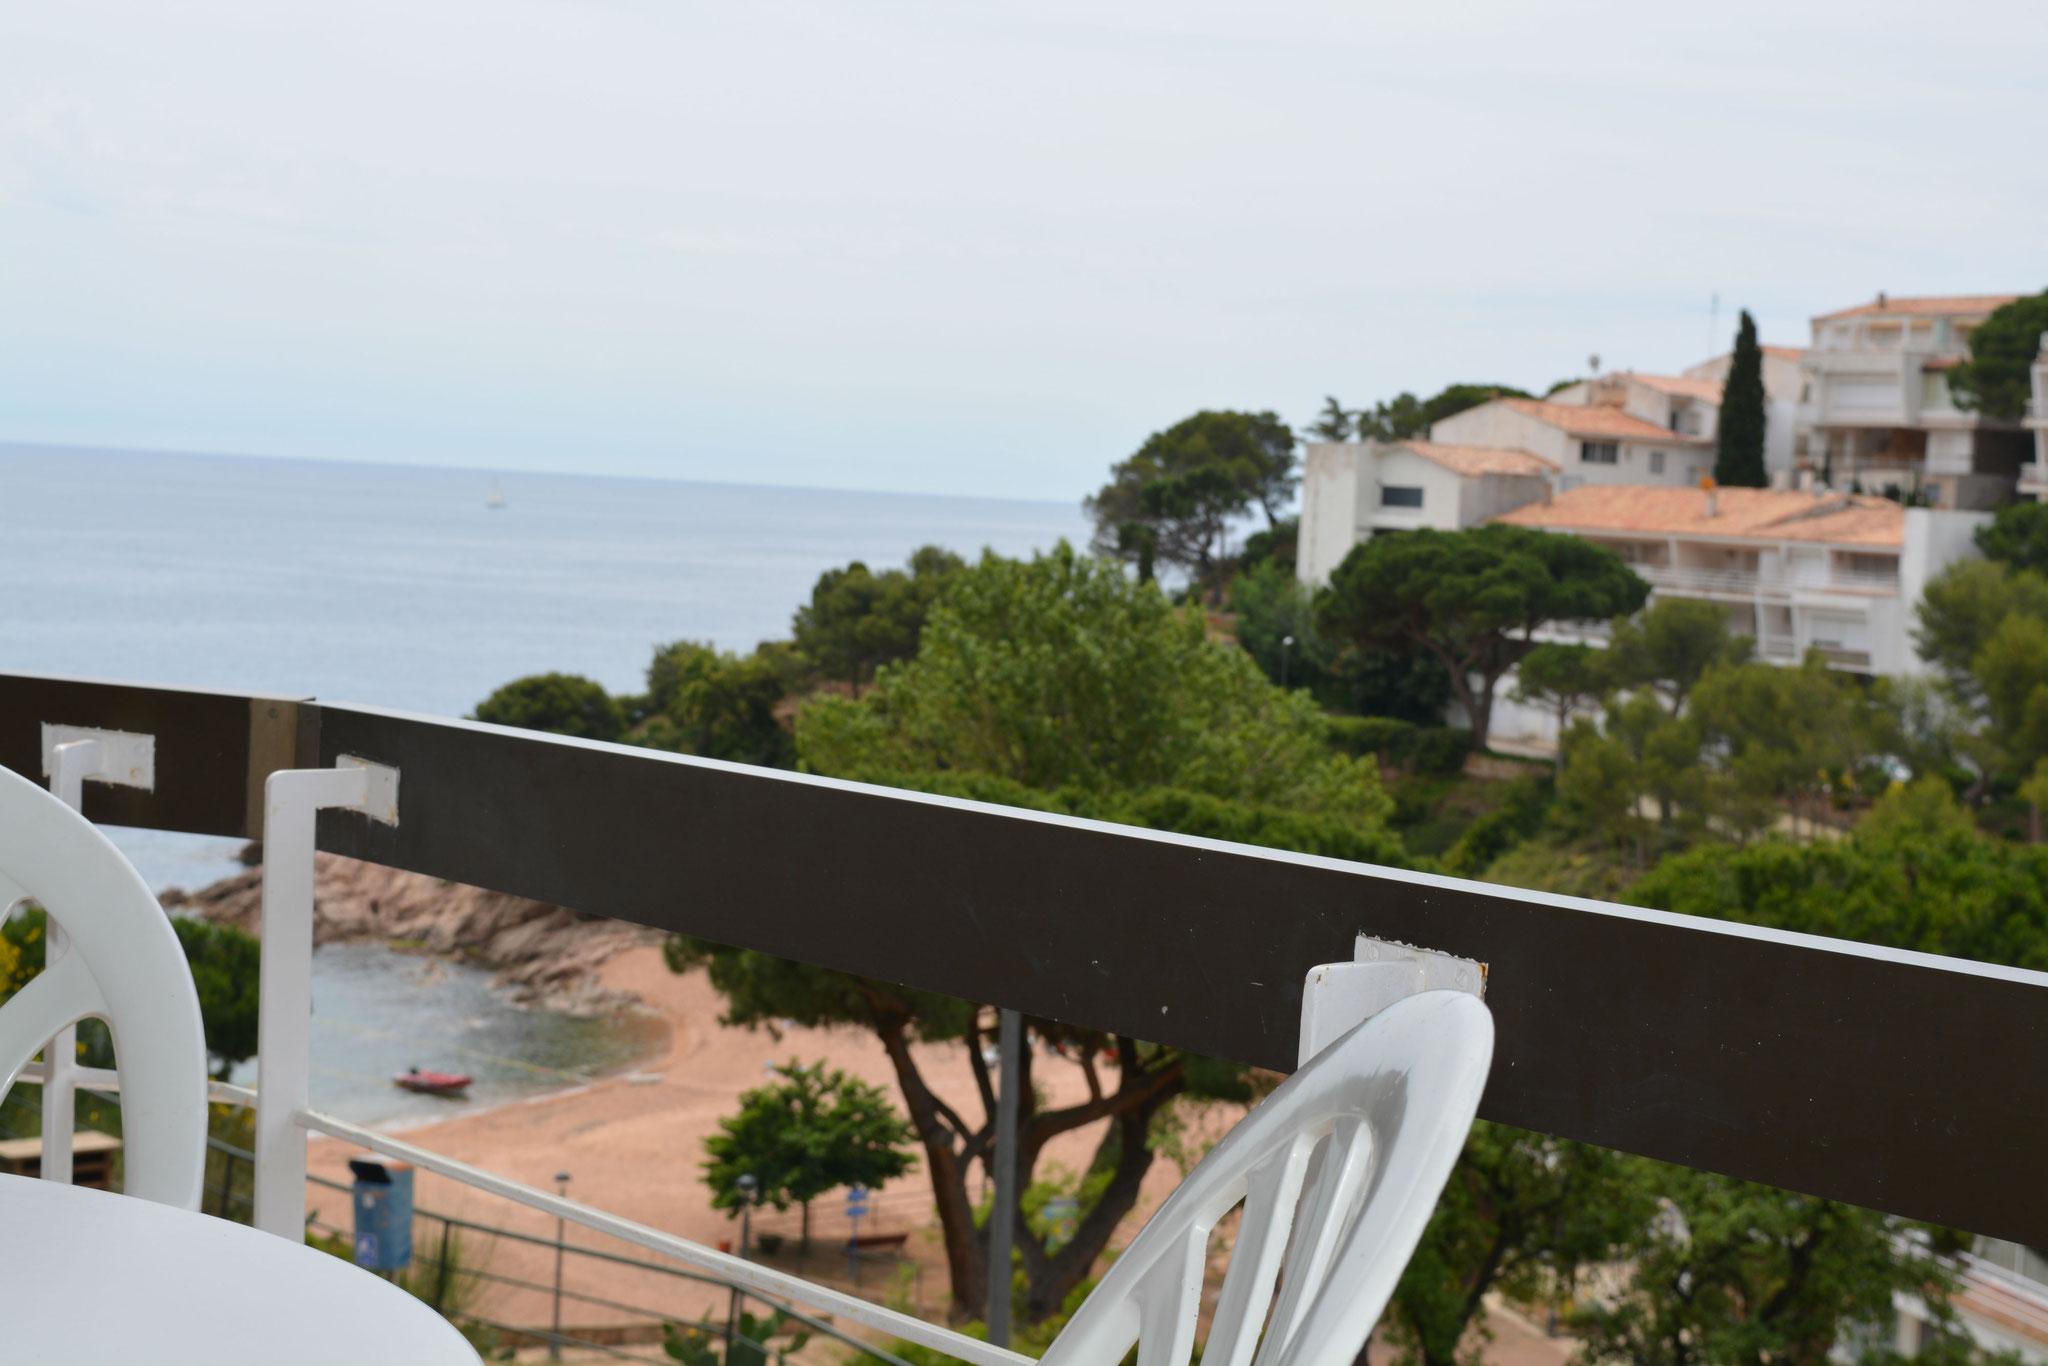 Terrace overlooking the beach